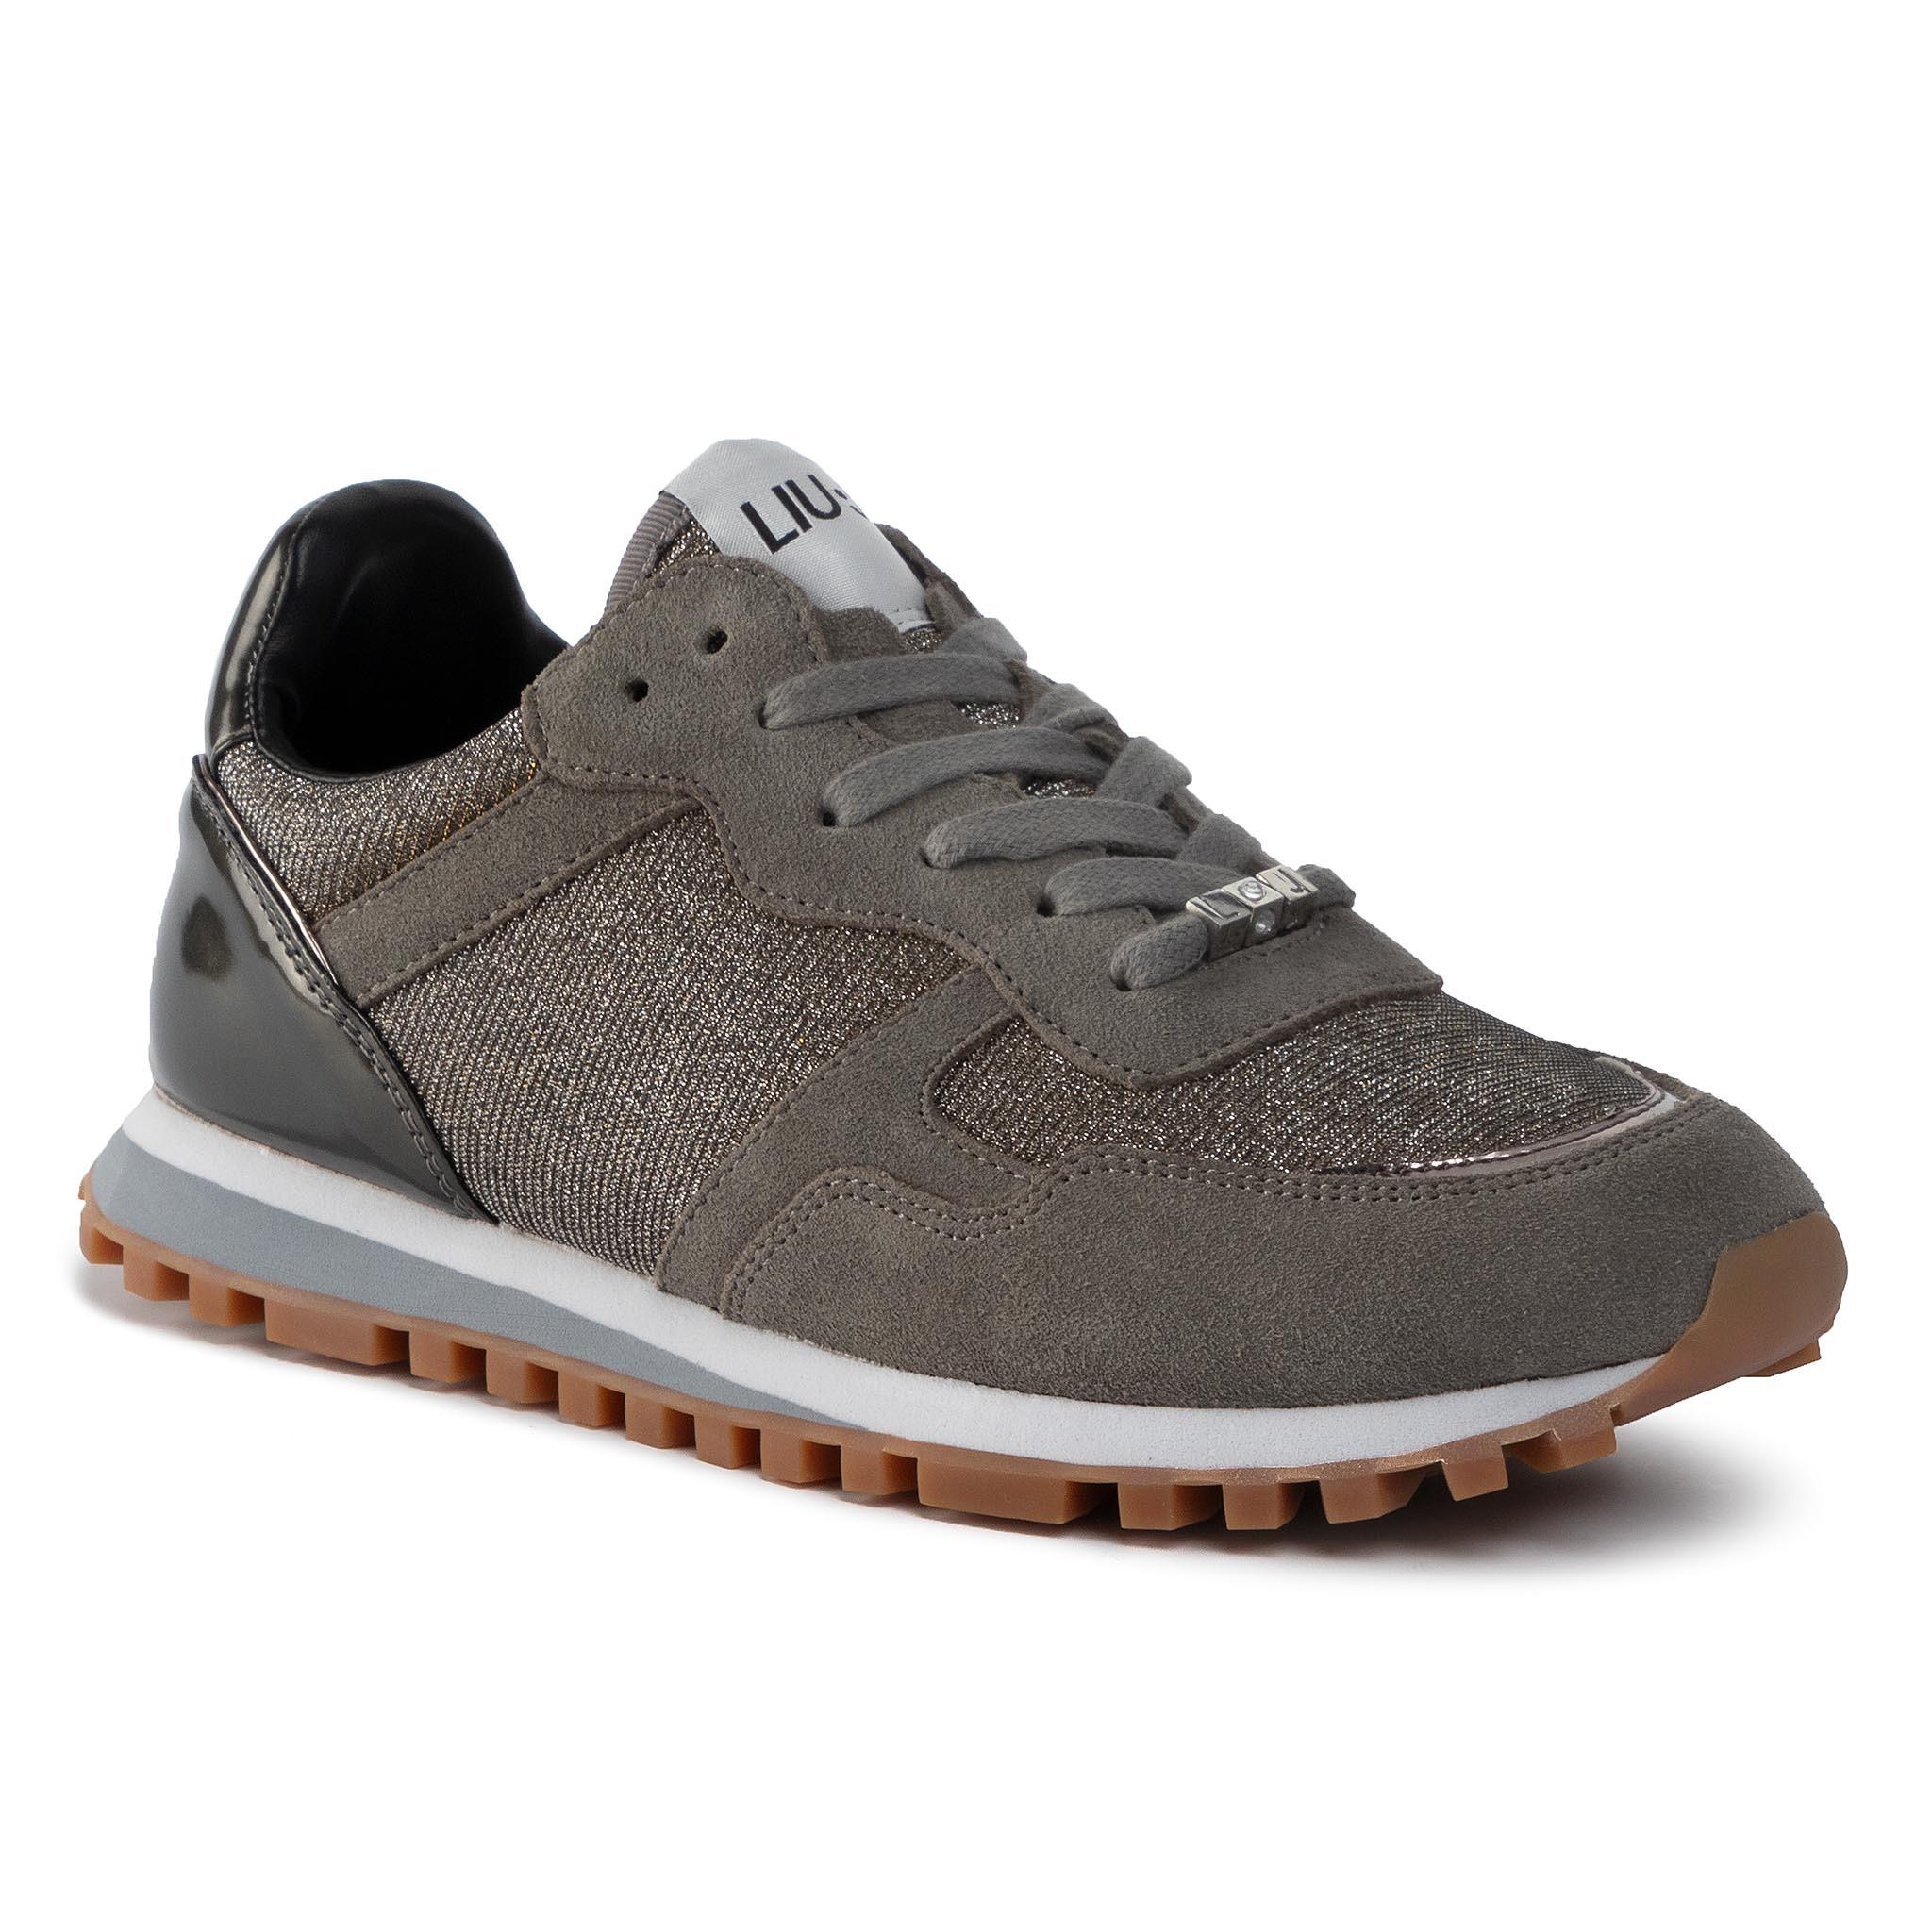 Sneakers LIU JO - Wonder BXX049 PX067 Dk Grey S1017